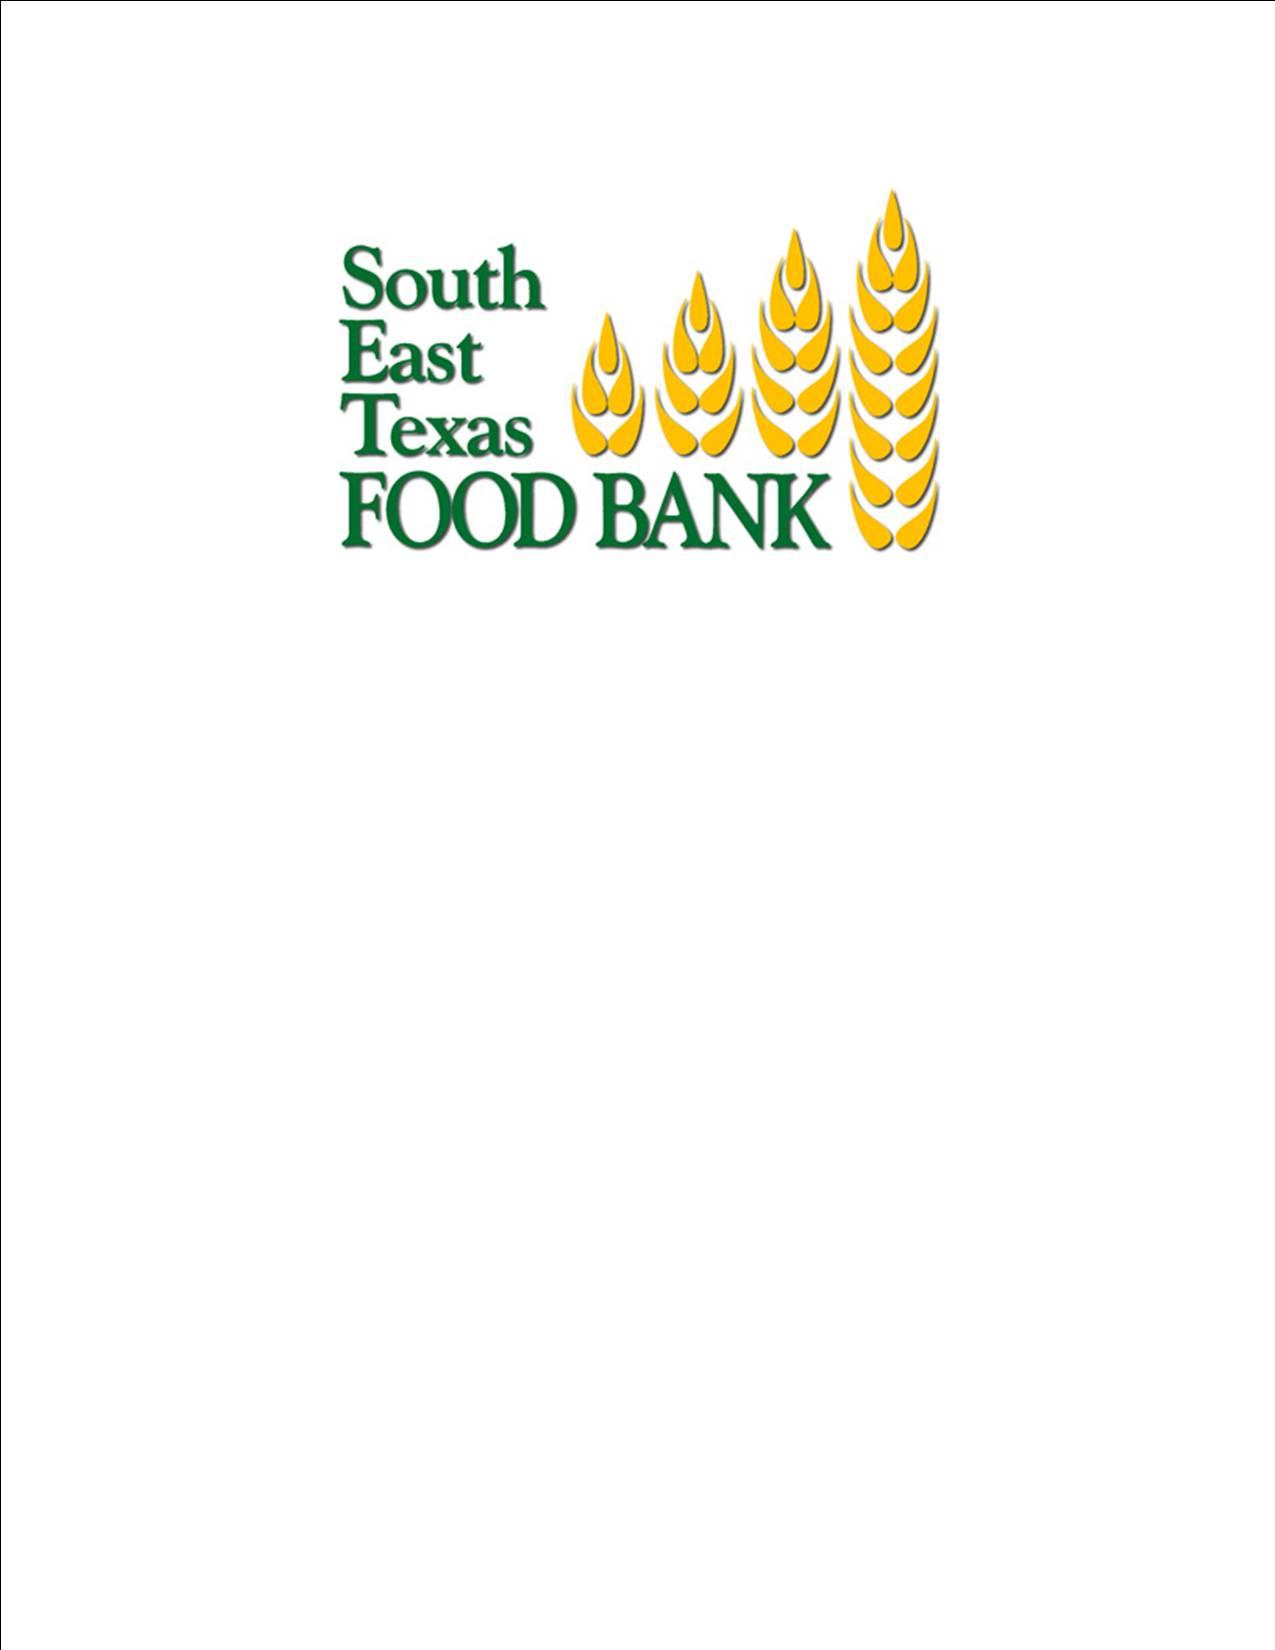 Southeast Texas Food Bank Guidestar Profile